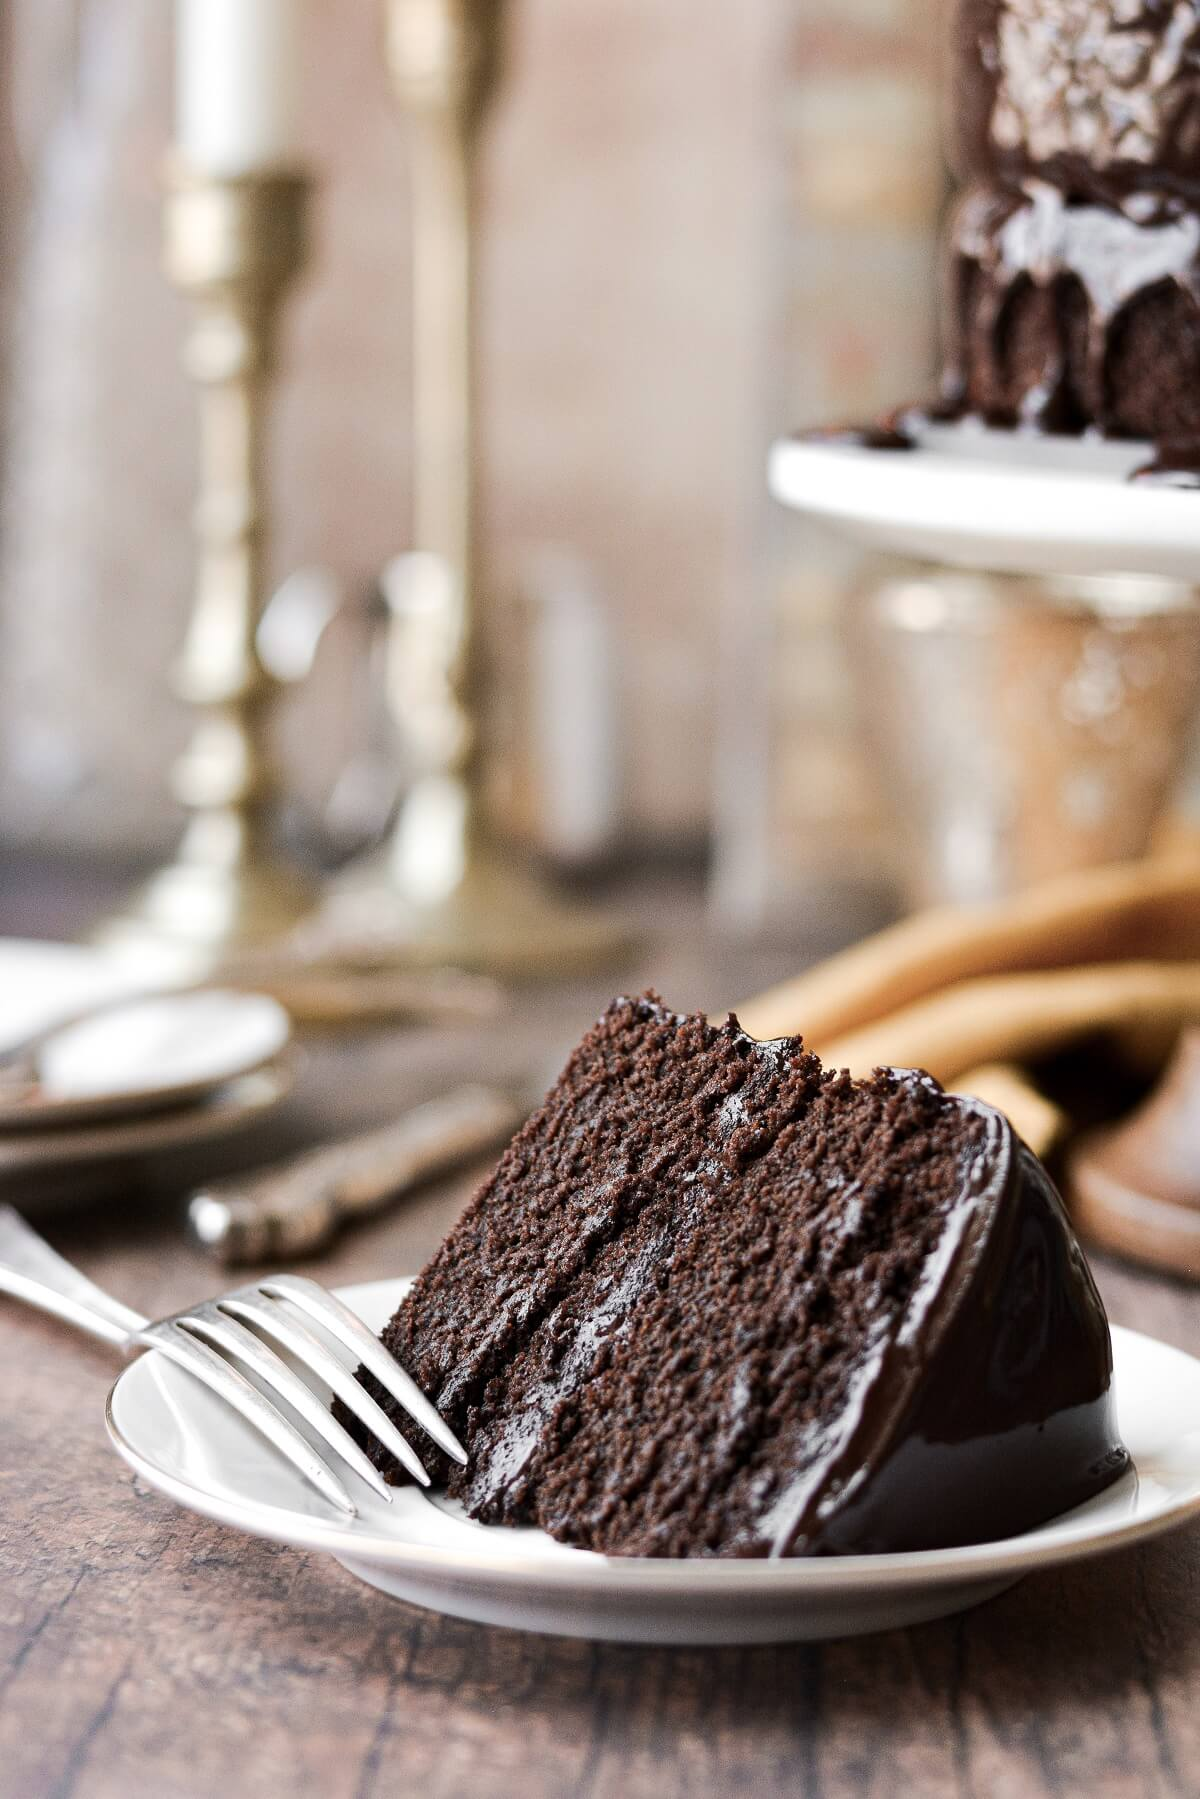 A slice of chocolate fudge cake.